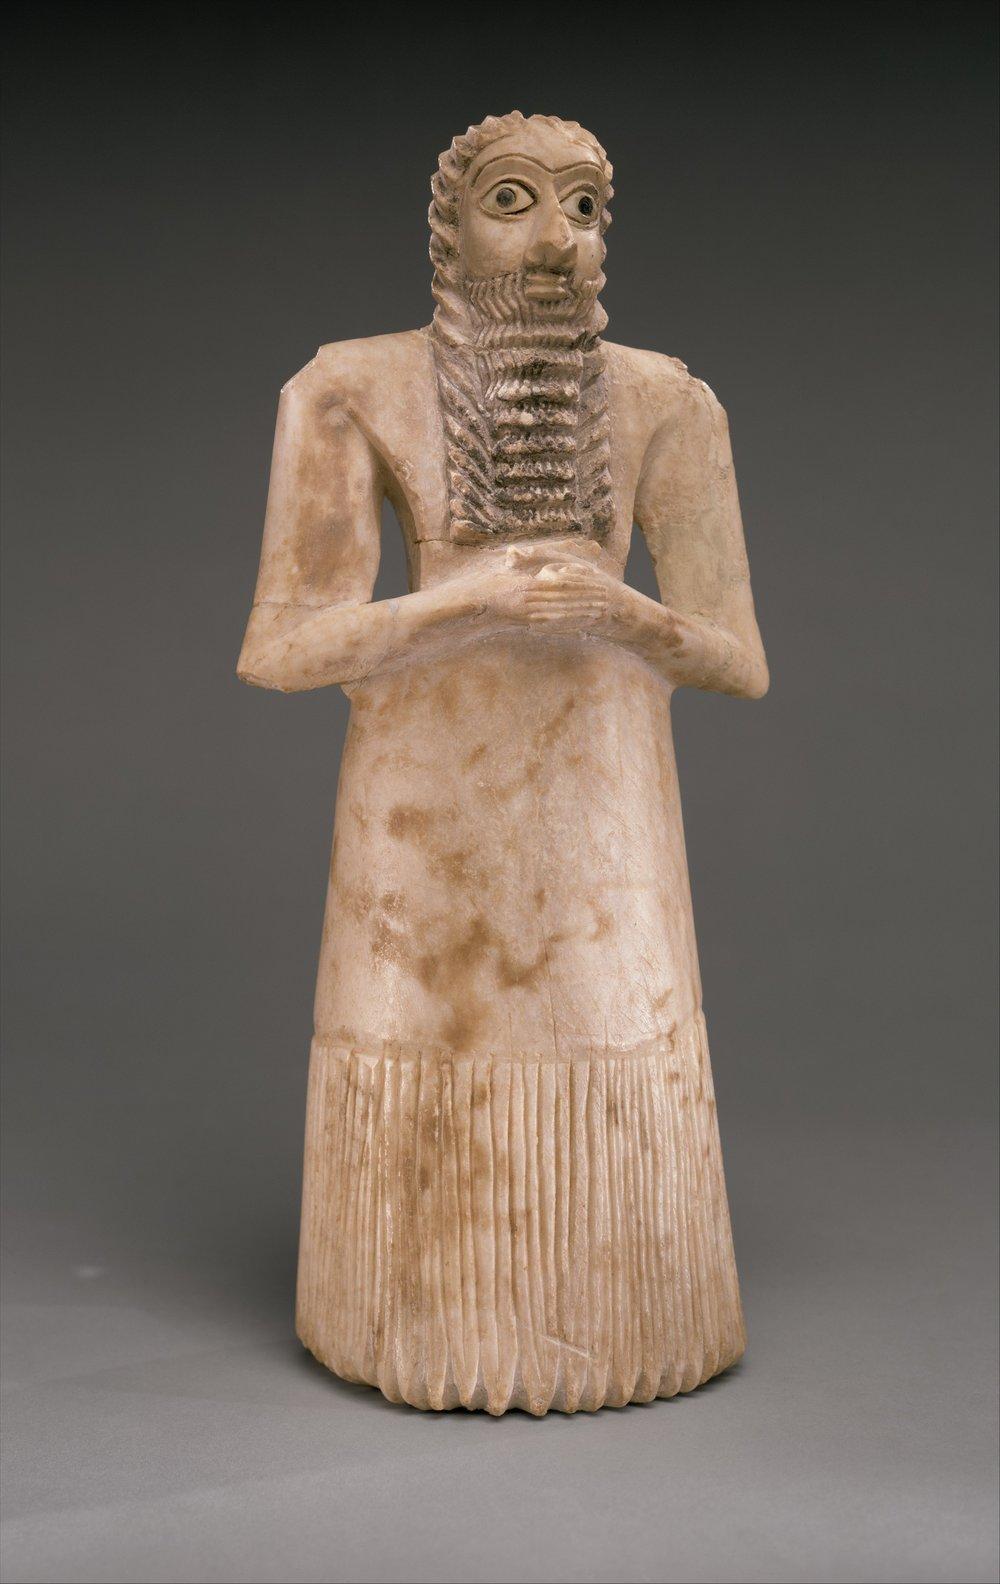 Standing Male Worshipper, photo from Metropolitan Museum of Art, Sumerian, ca. 2900–2600 B.C., Dimensions: 11 5/8 x 5 1/8 x 3 7/8 in. (29.5 x 12.9 x 10 cm), Gypsum alabaster, shell, black limestone, bitumen